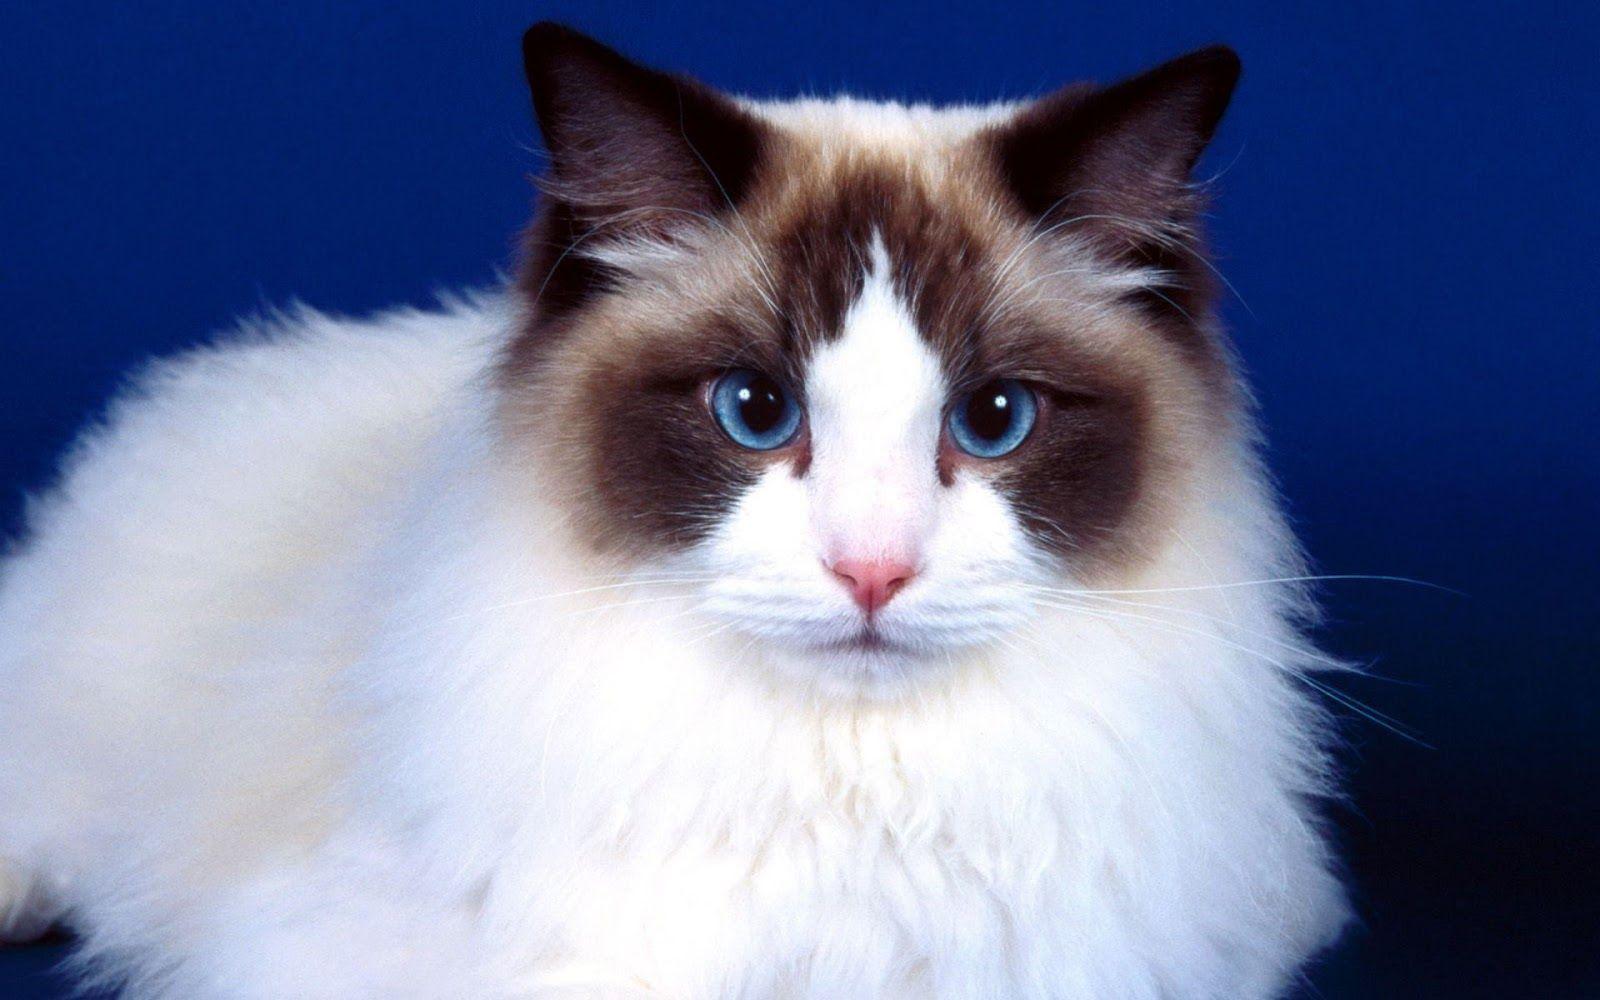 Fonds D Ecran De Chats En Full Hd Ragdoll Chats Adorables Animaux Les Plus Mignons